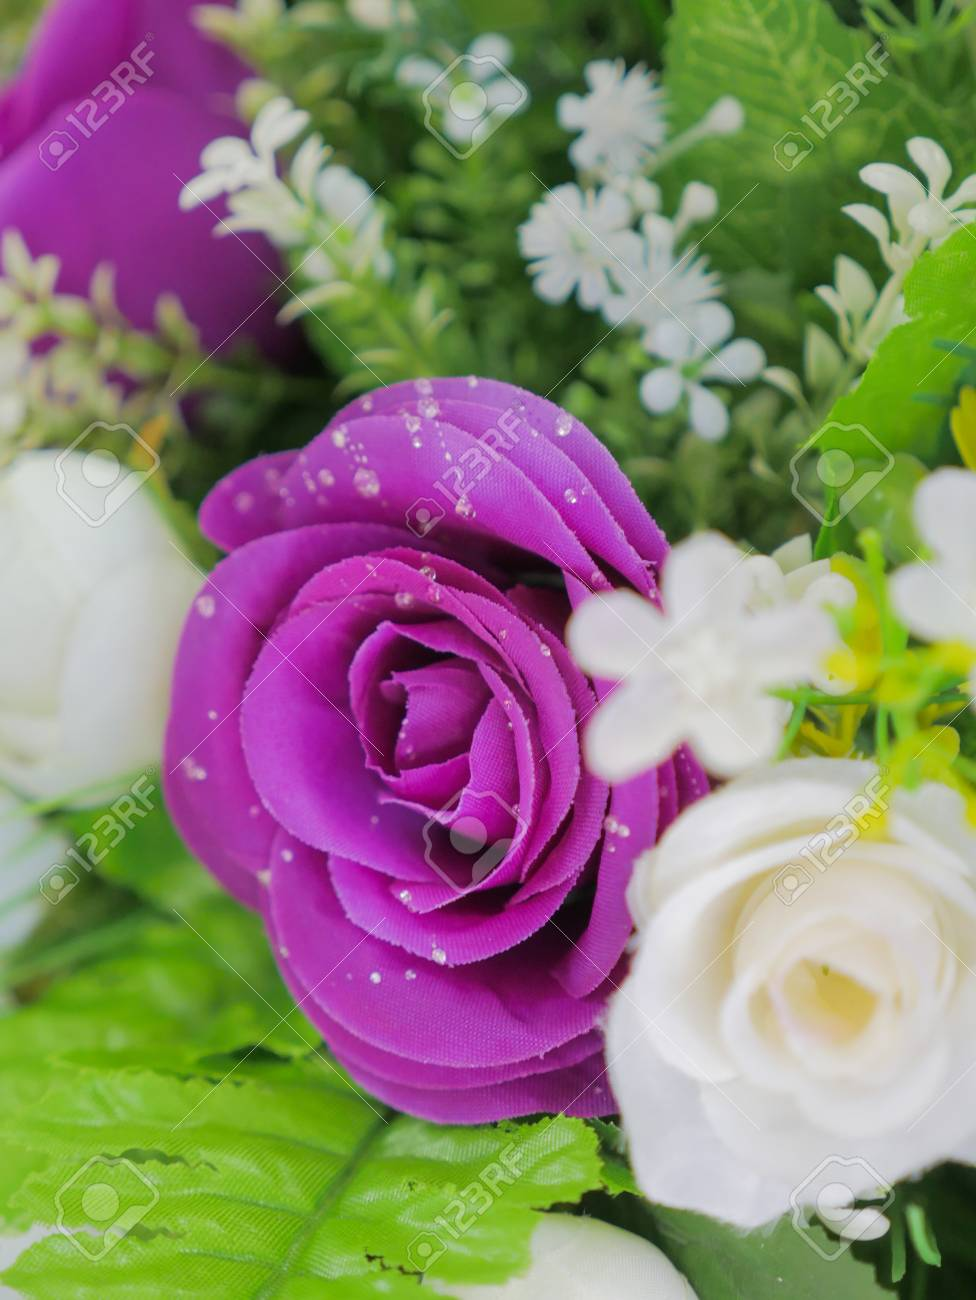 Elegant and beautiful fake purple rose flowers with artificial elegant and beautiful fake purple rose flowers with artificial water drop stock photo 83079502 mightylinksfo